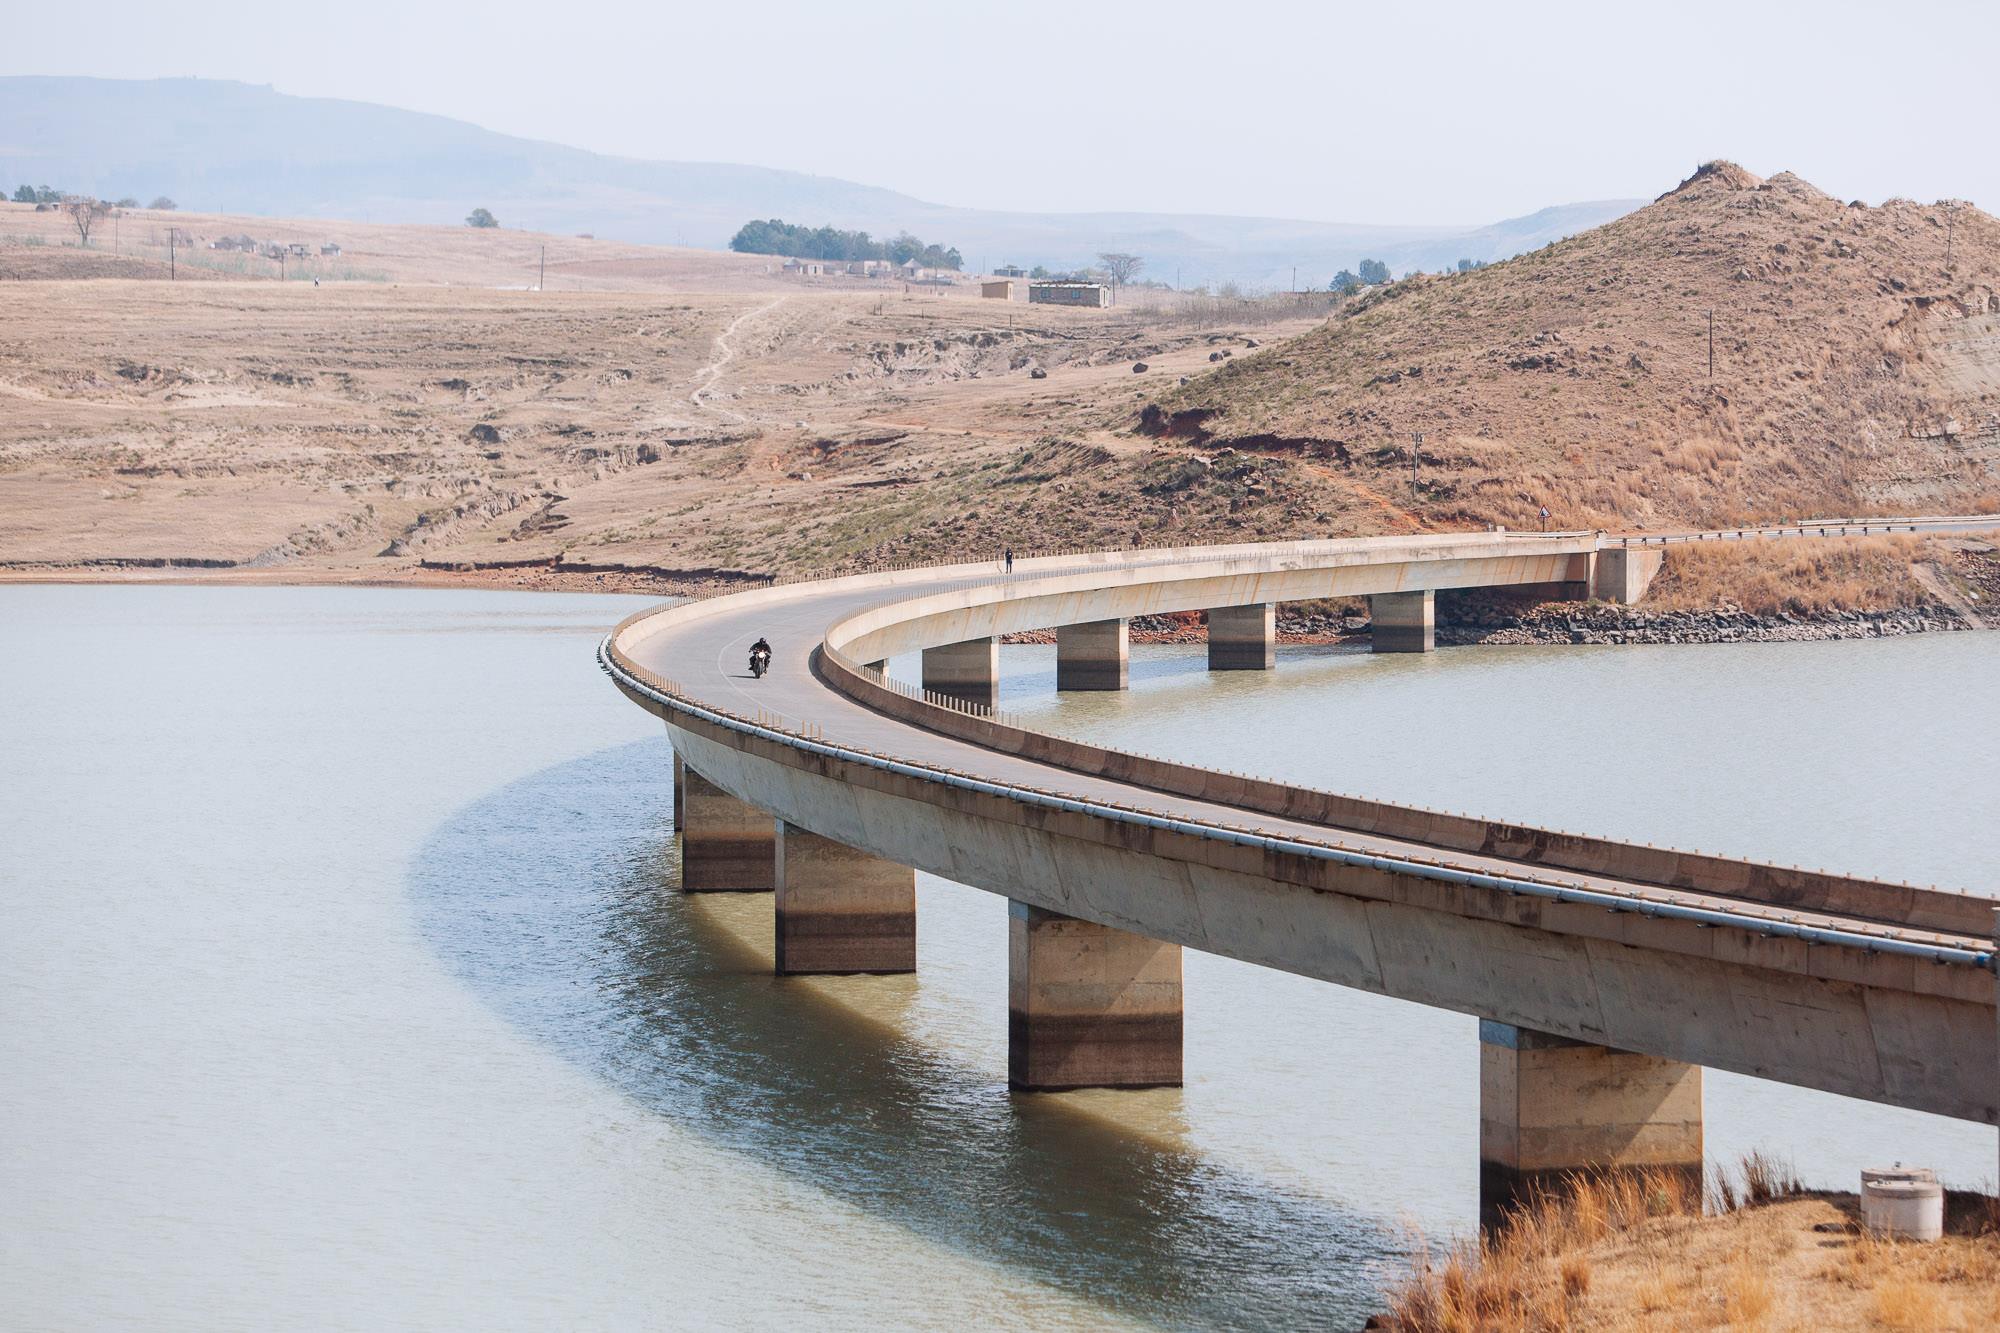 Crossing the Woodstock Dam